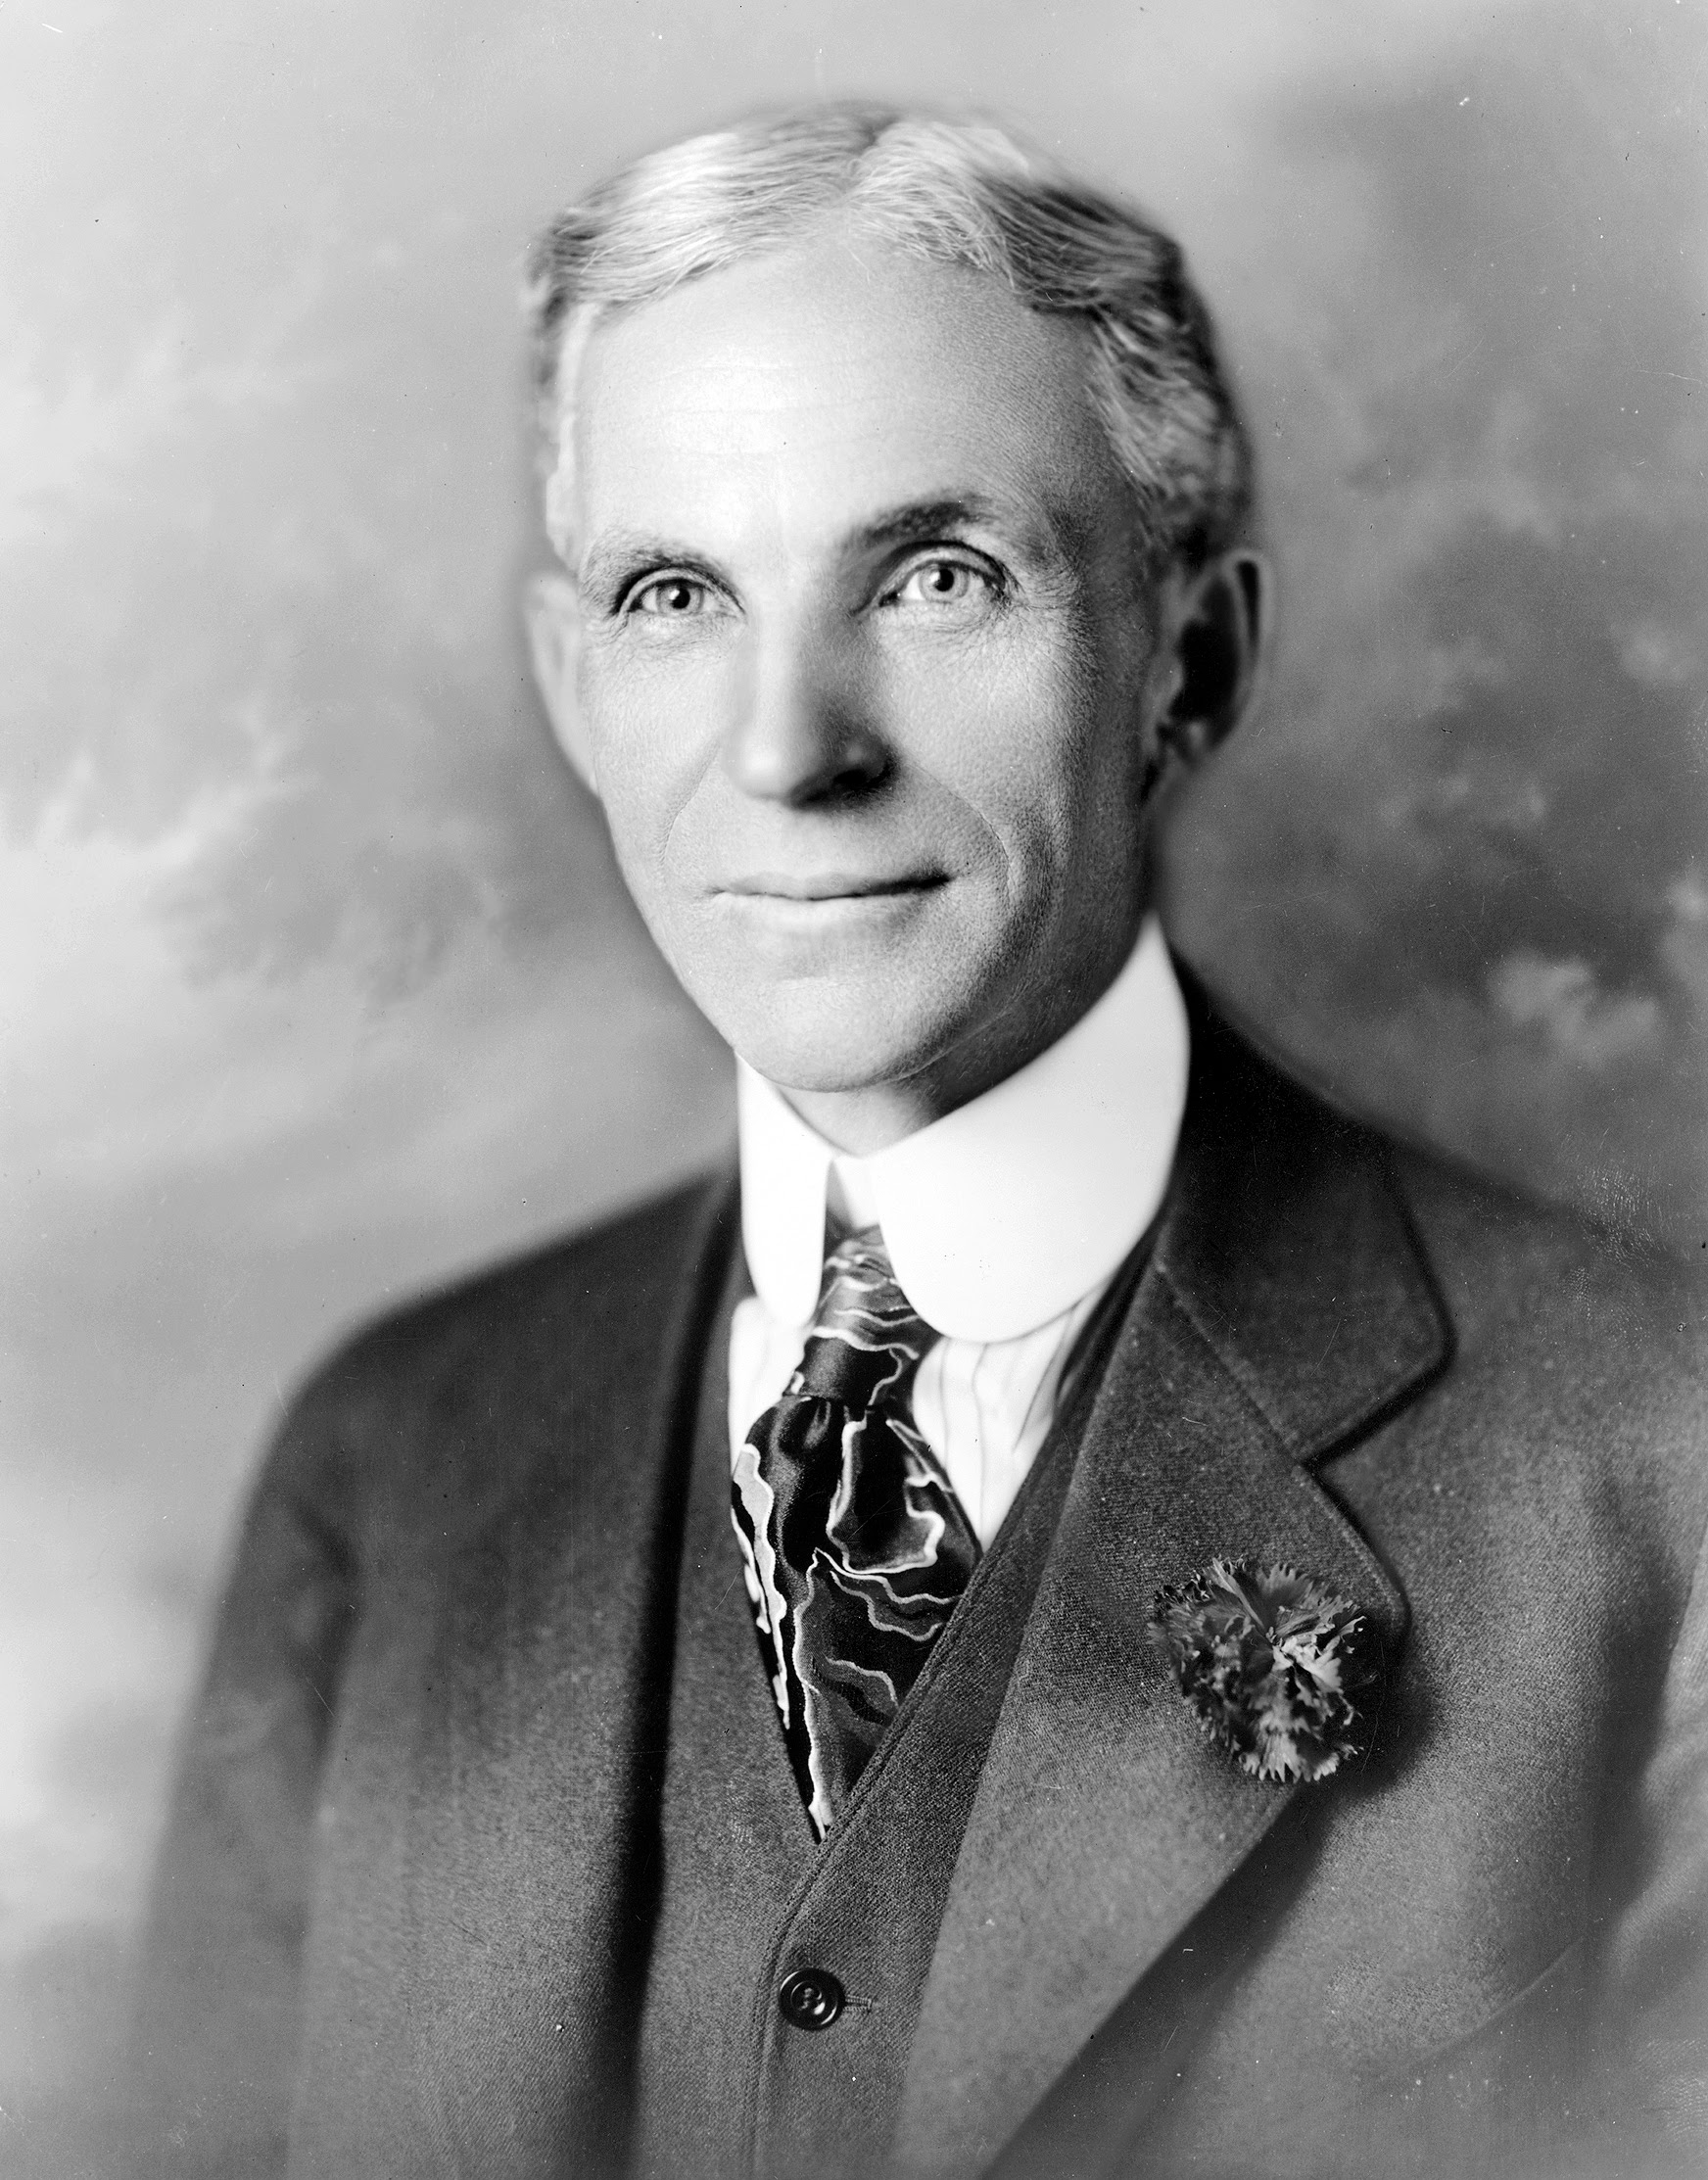 Hartsook: Henry Ford